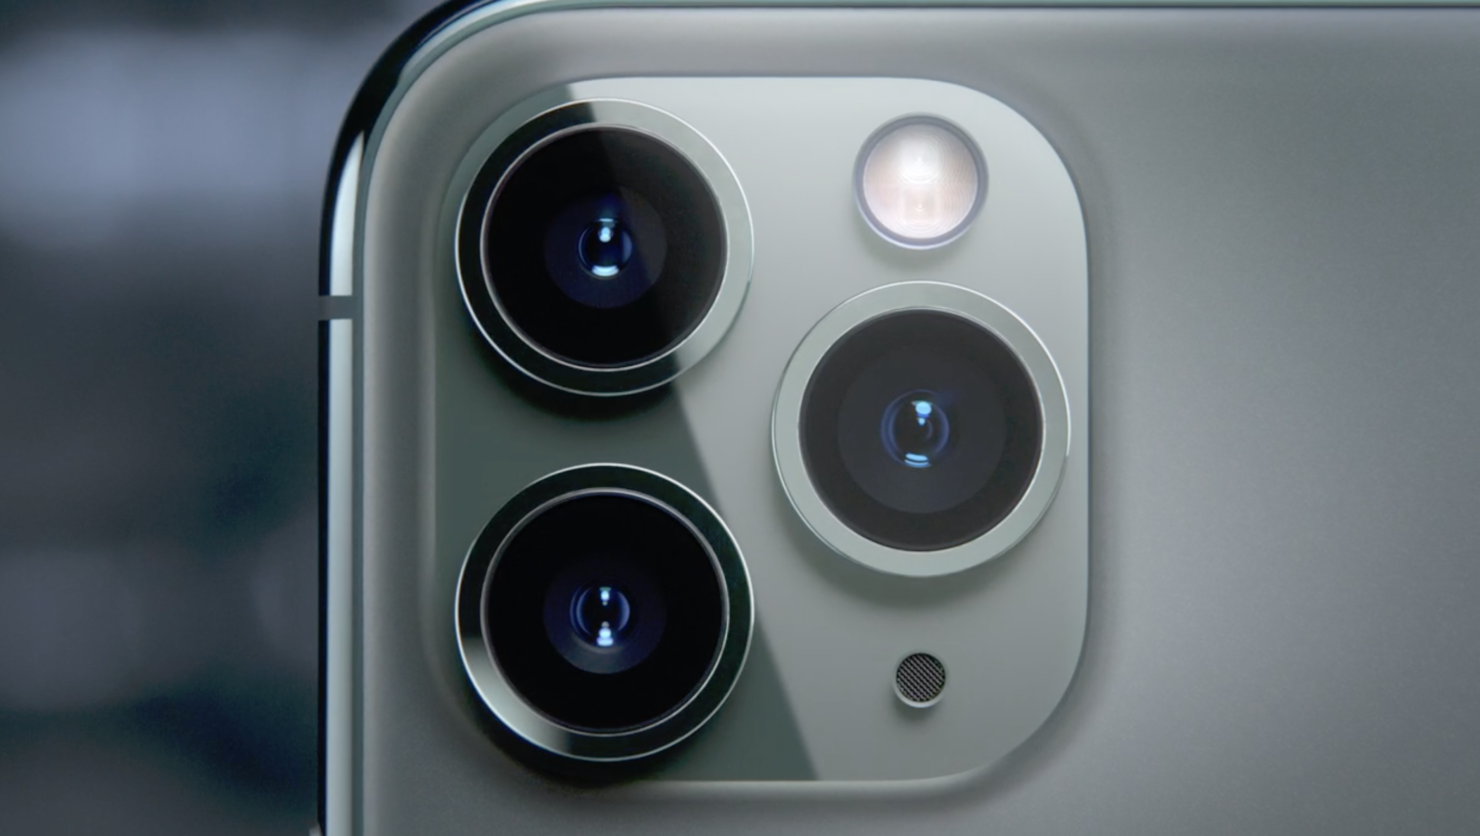 iPhone 11 Pro back camera